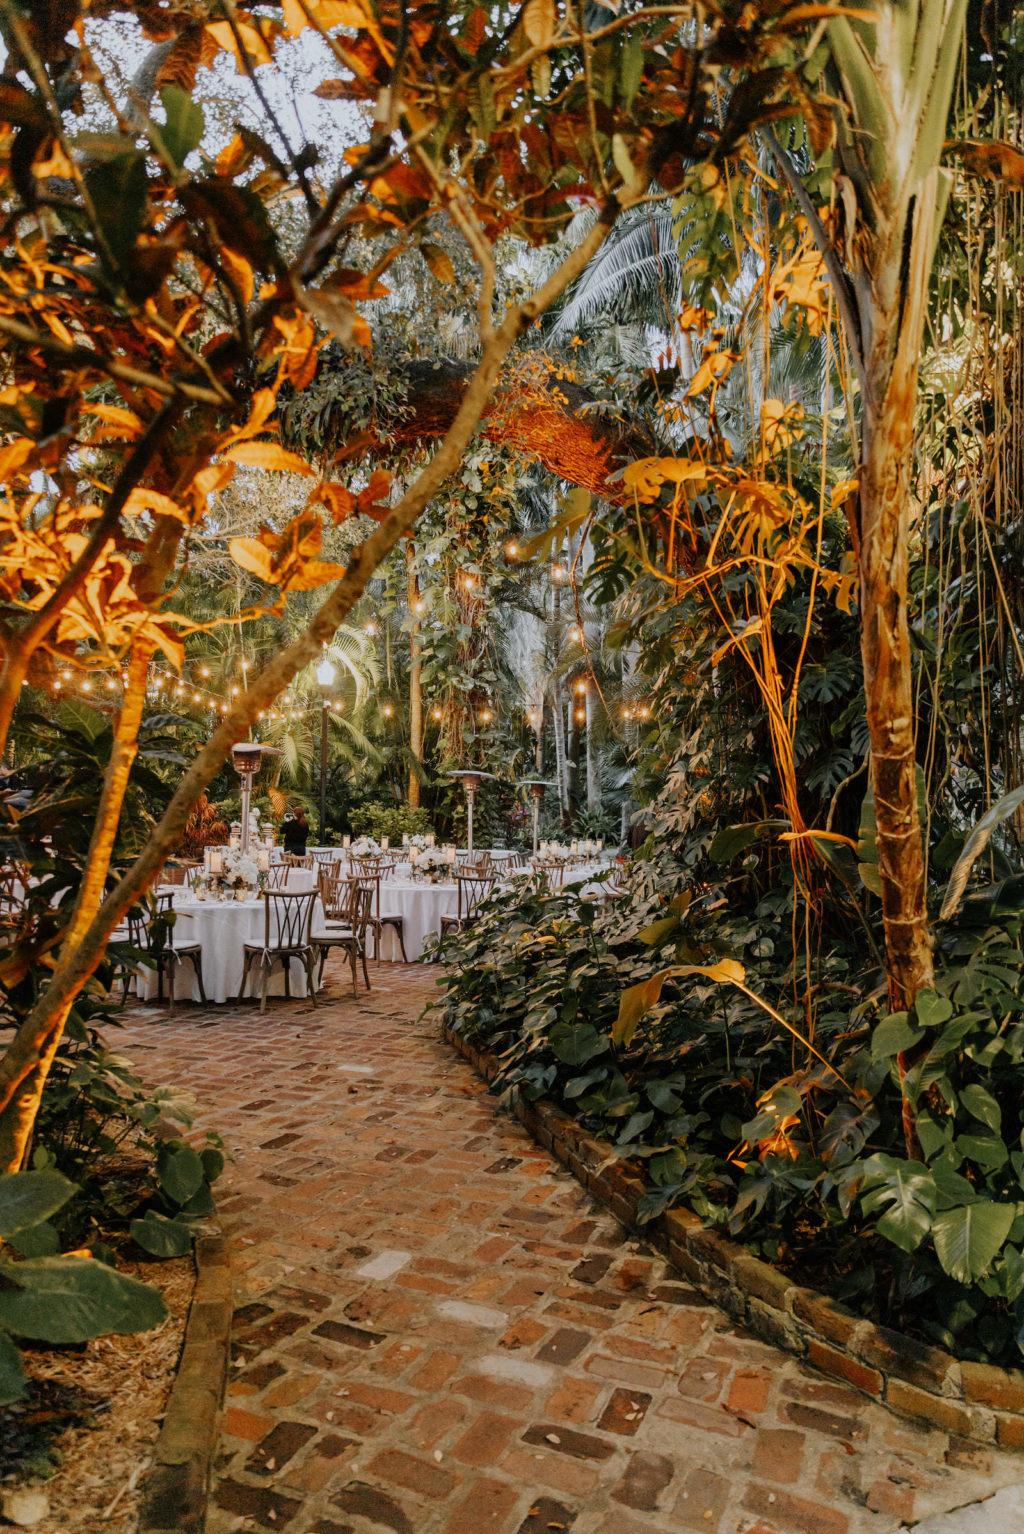 St. Pete Outdoor Wedding Reception Under the Palms with Cafe Lighting   Sunken Gardens